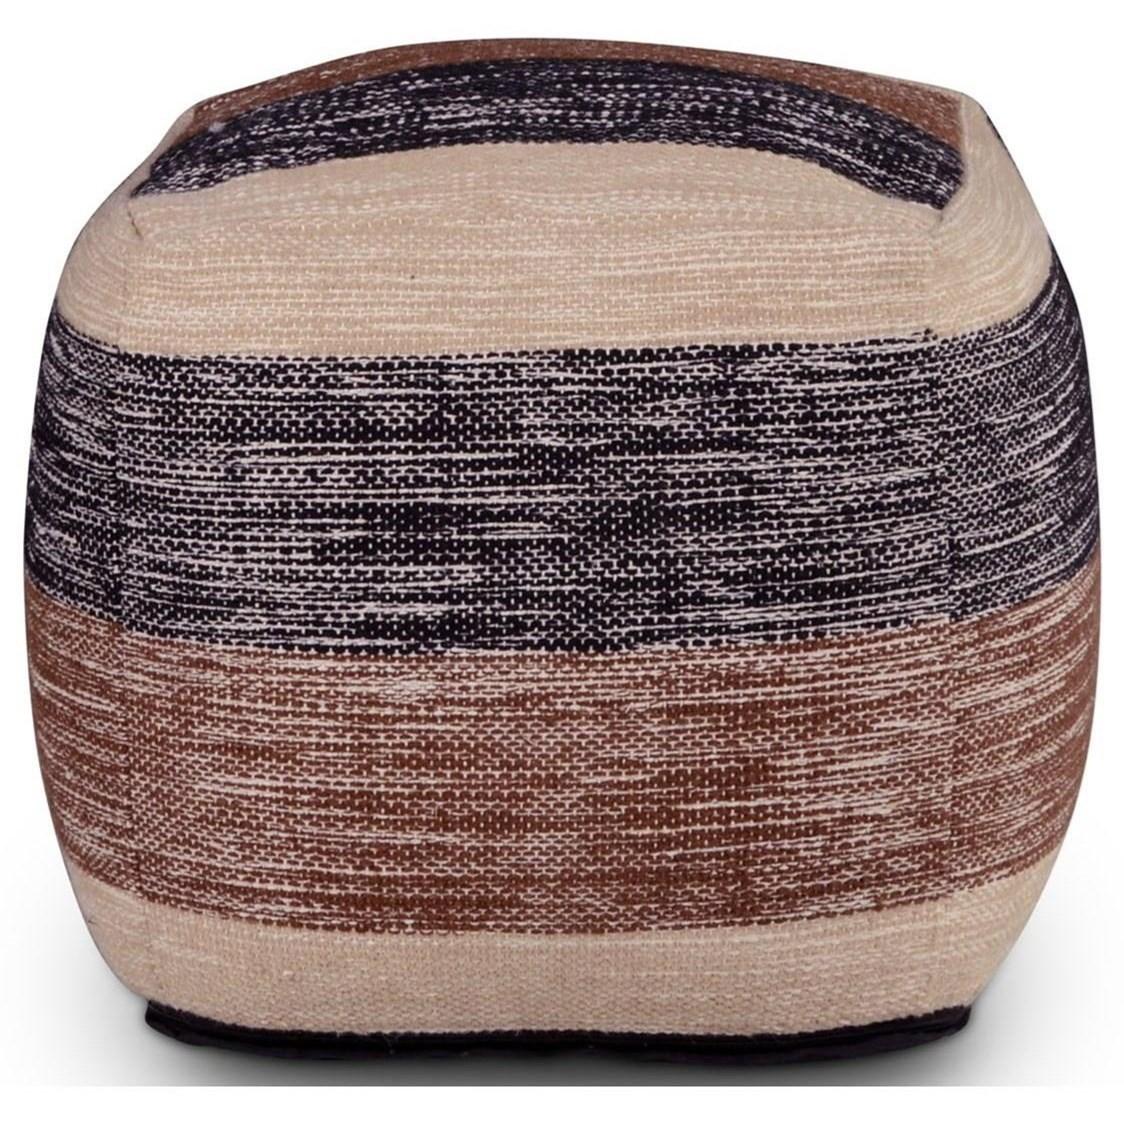 Steve Silver Jamal Jm180p Handwoven Cube Pouf O Dunk O Bright Furniture Poufs